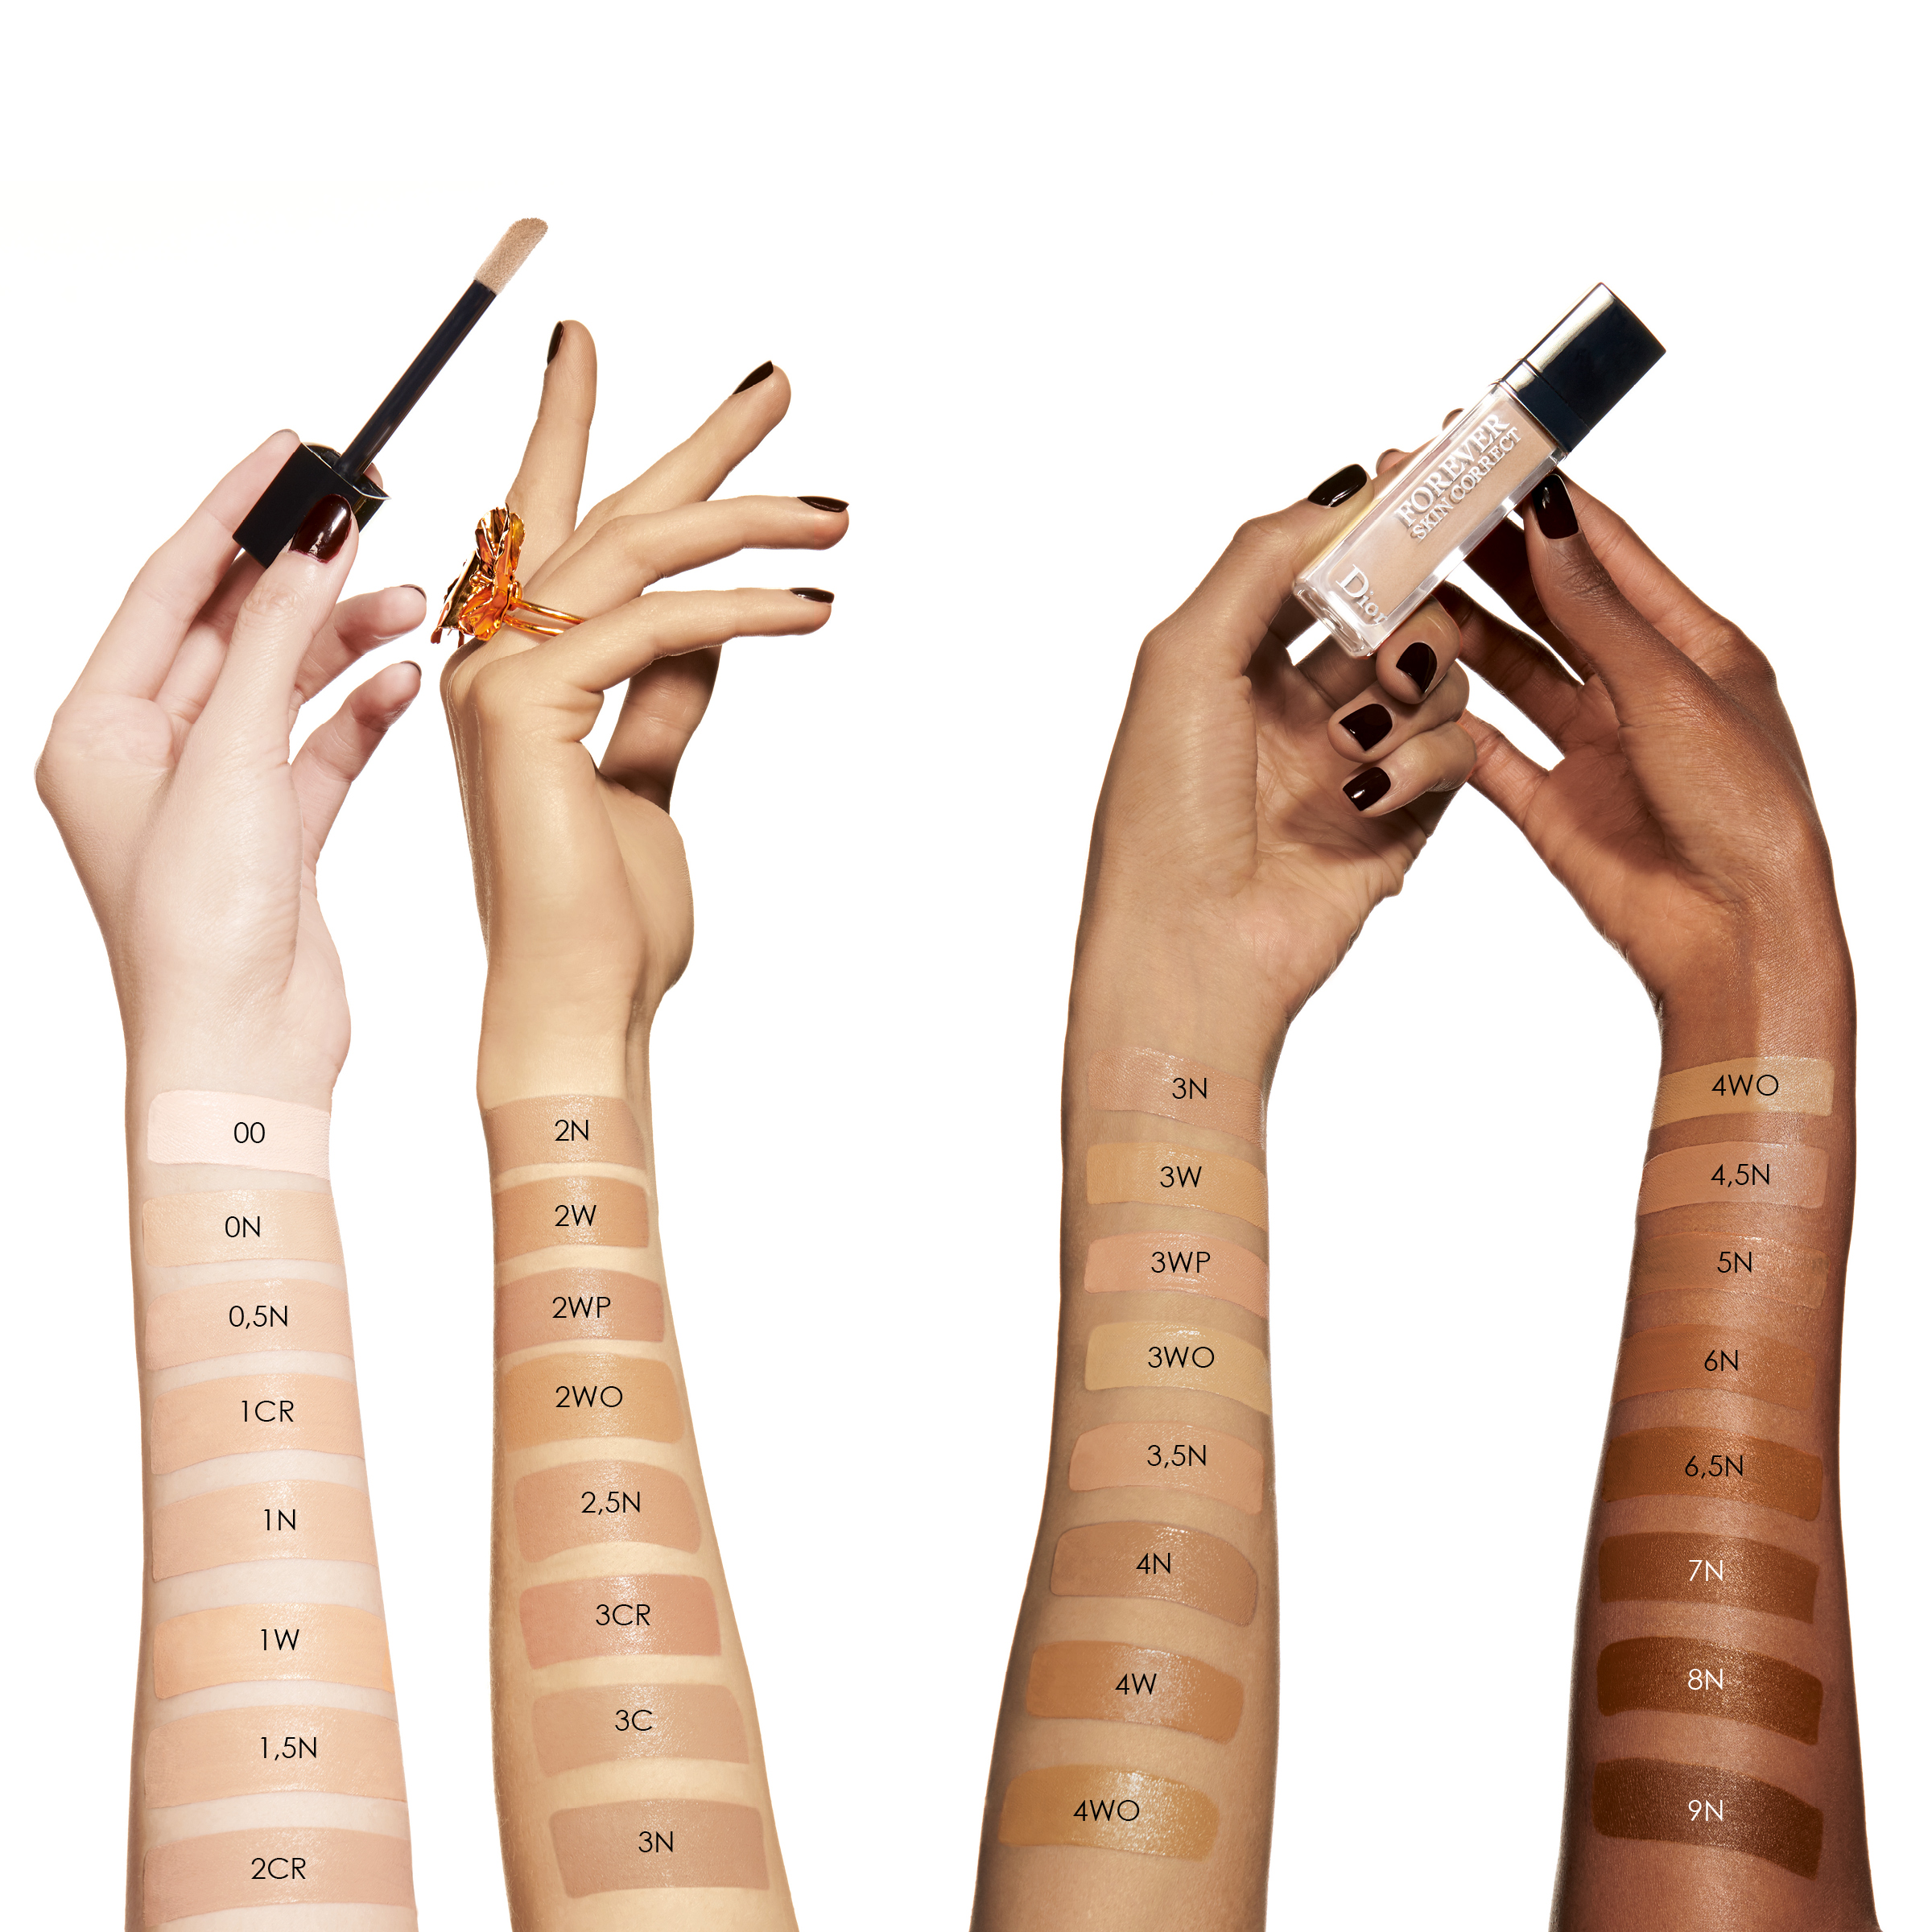 DIOR Forever Skin Correct, 1CR